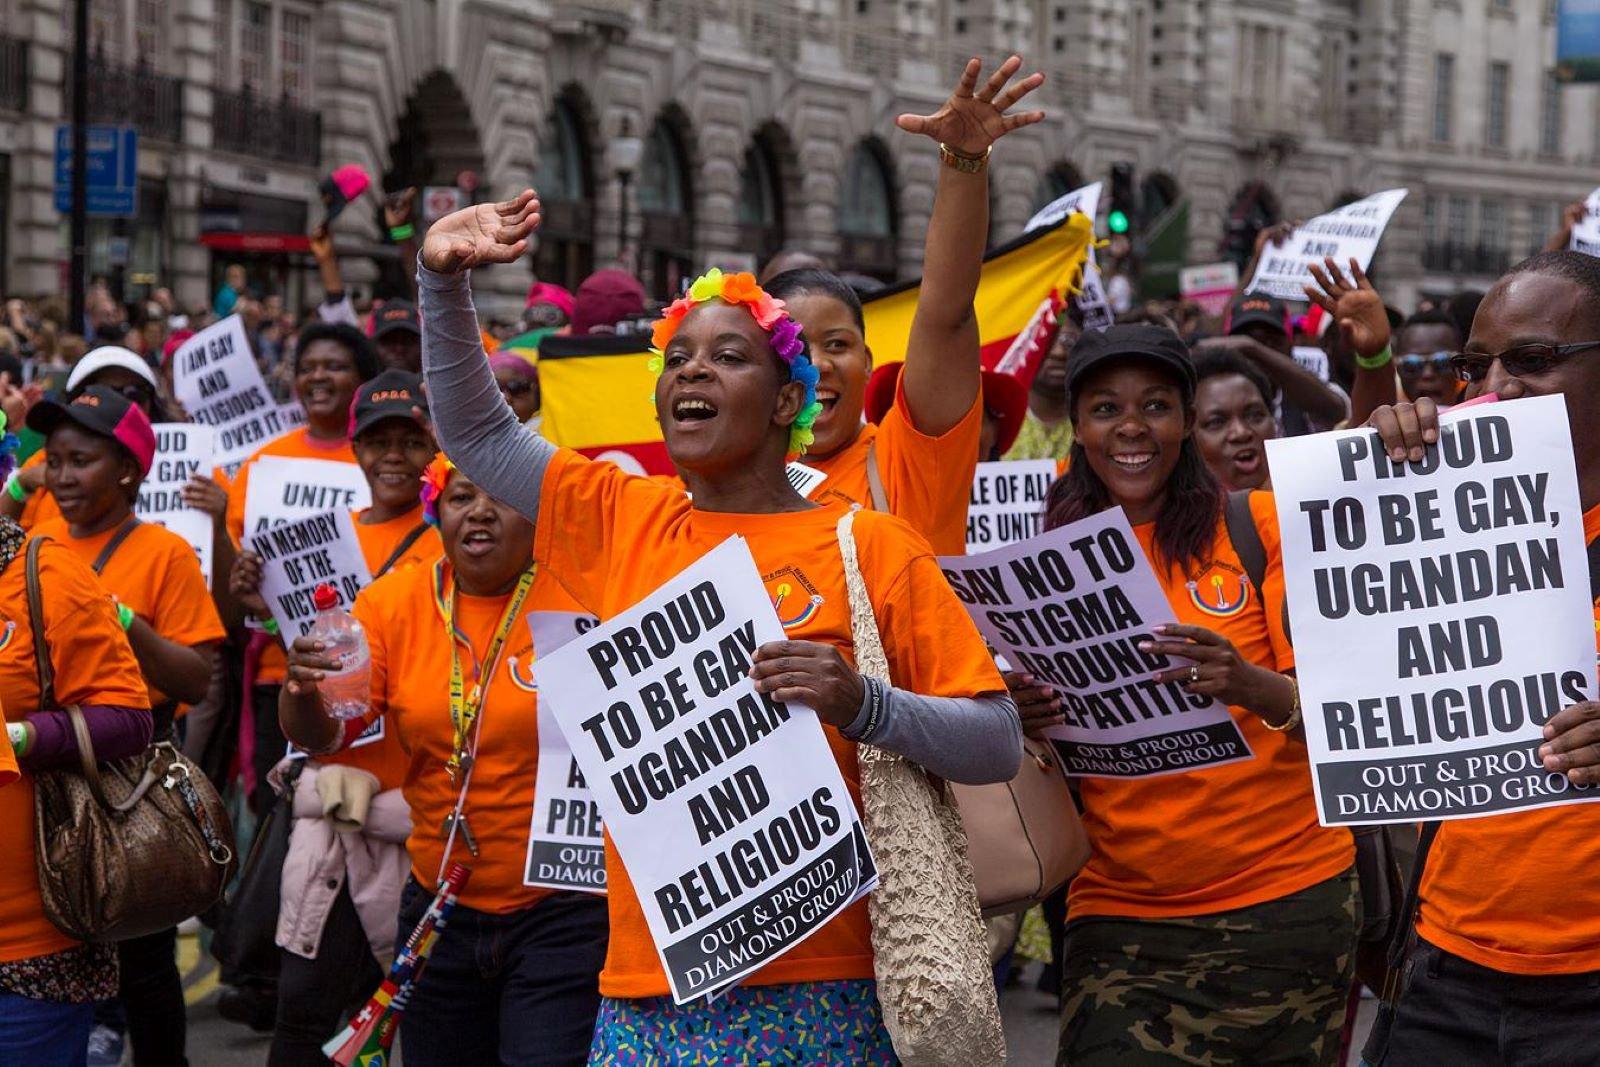 2016-London-pride-parade-lgbtq-Ugandans.jpg